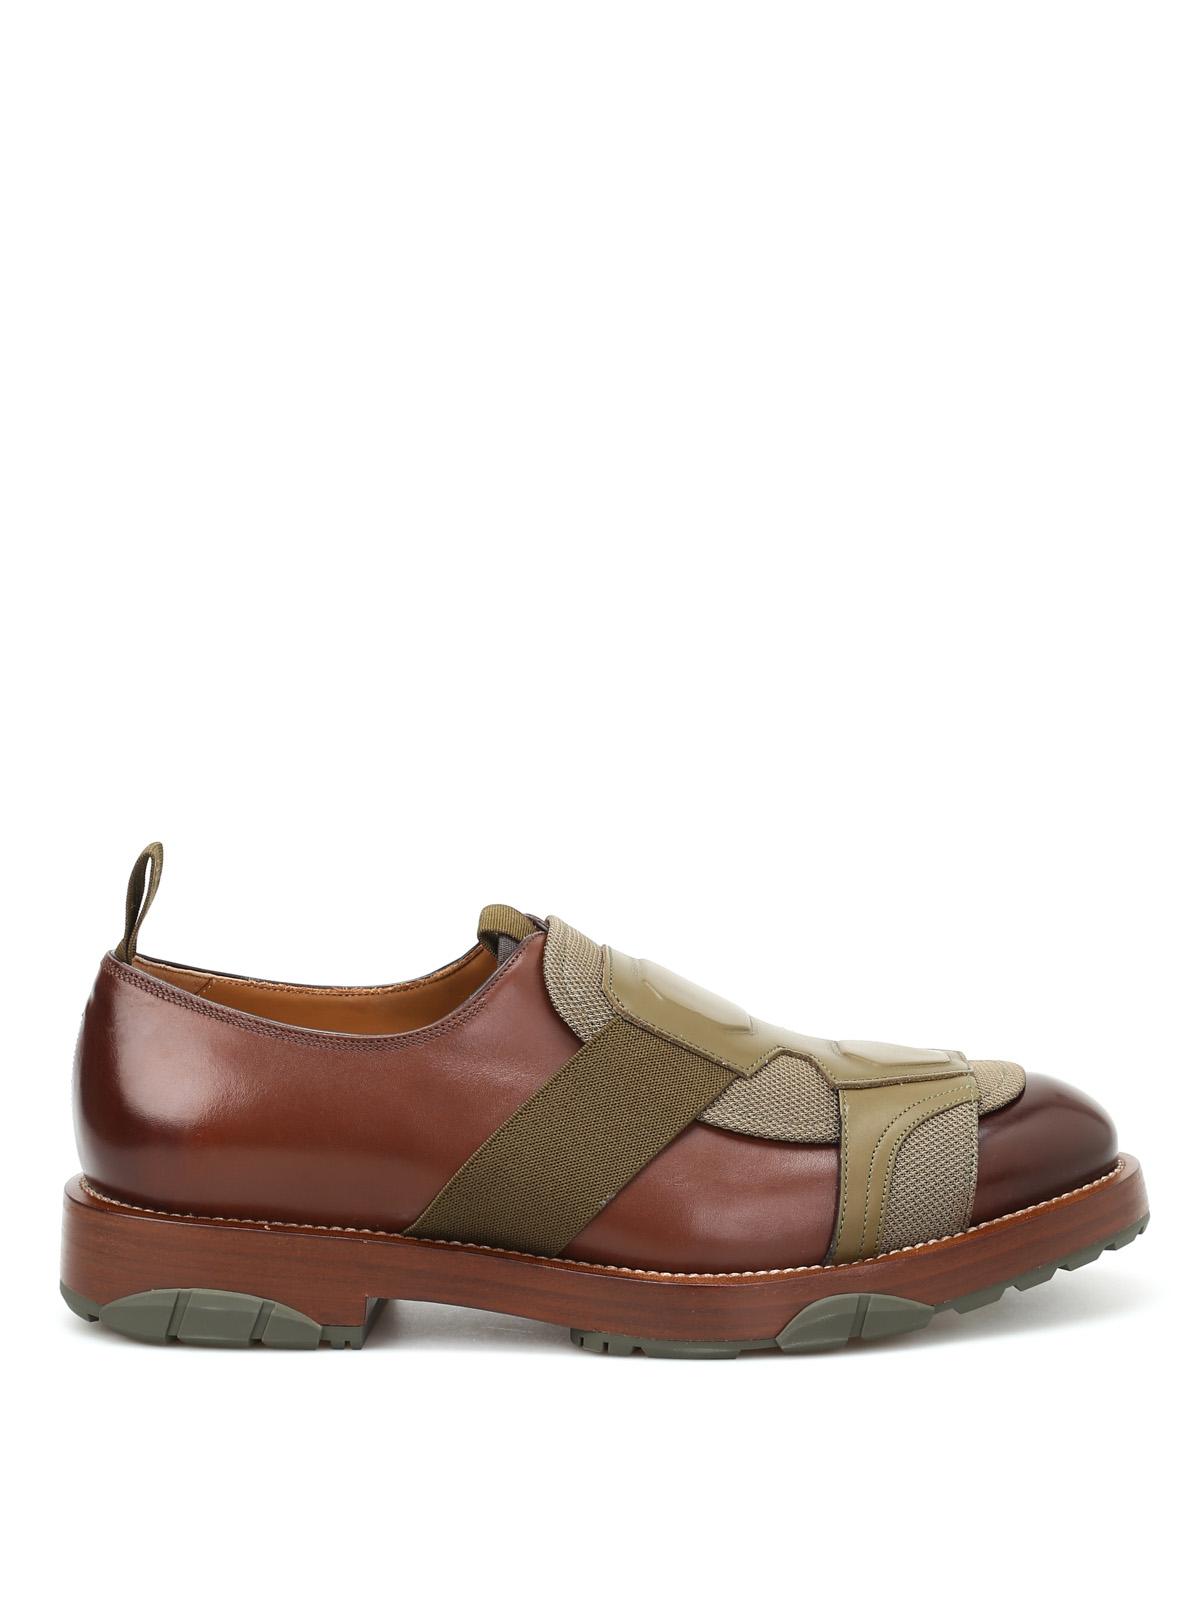 Men Salvatore Ferragamo Shoes Sale